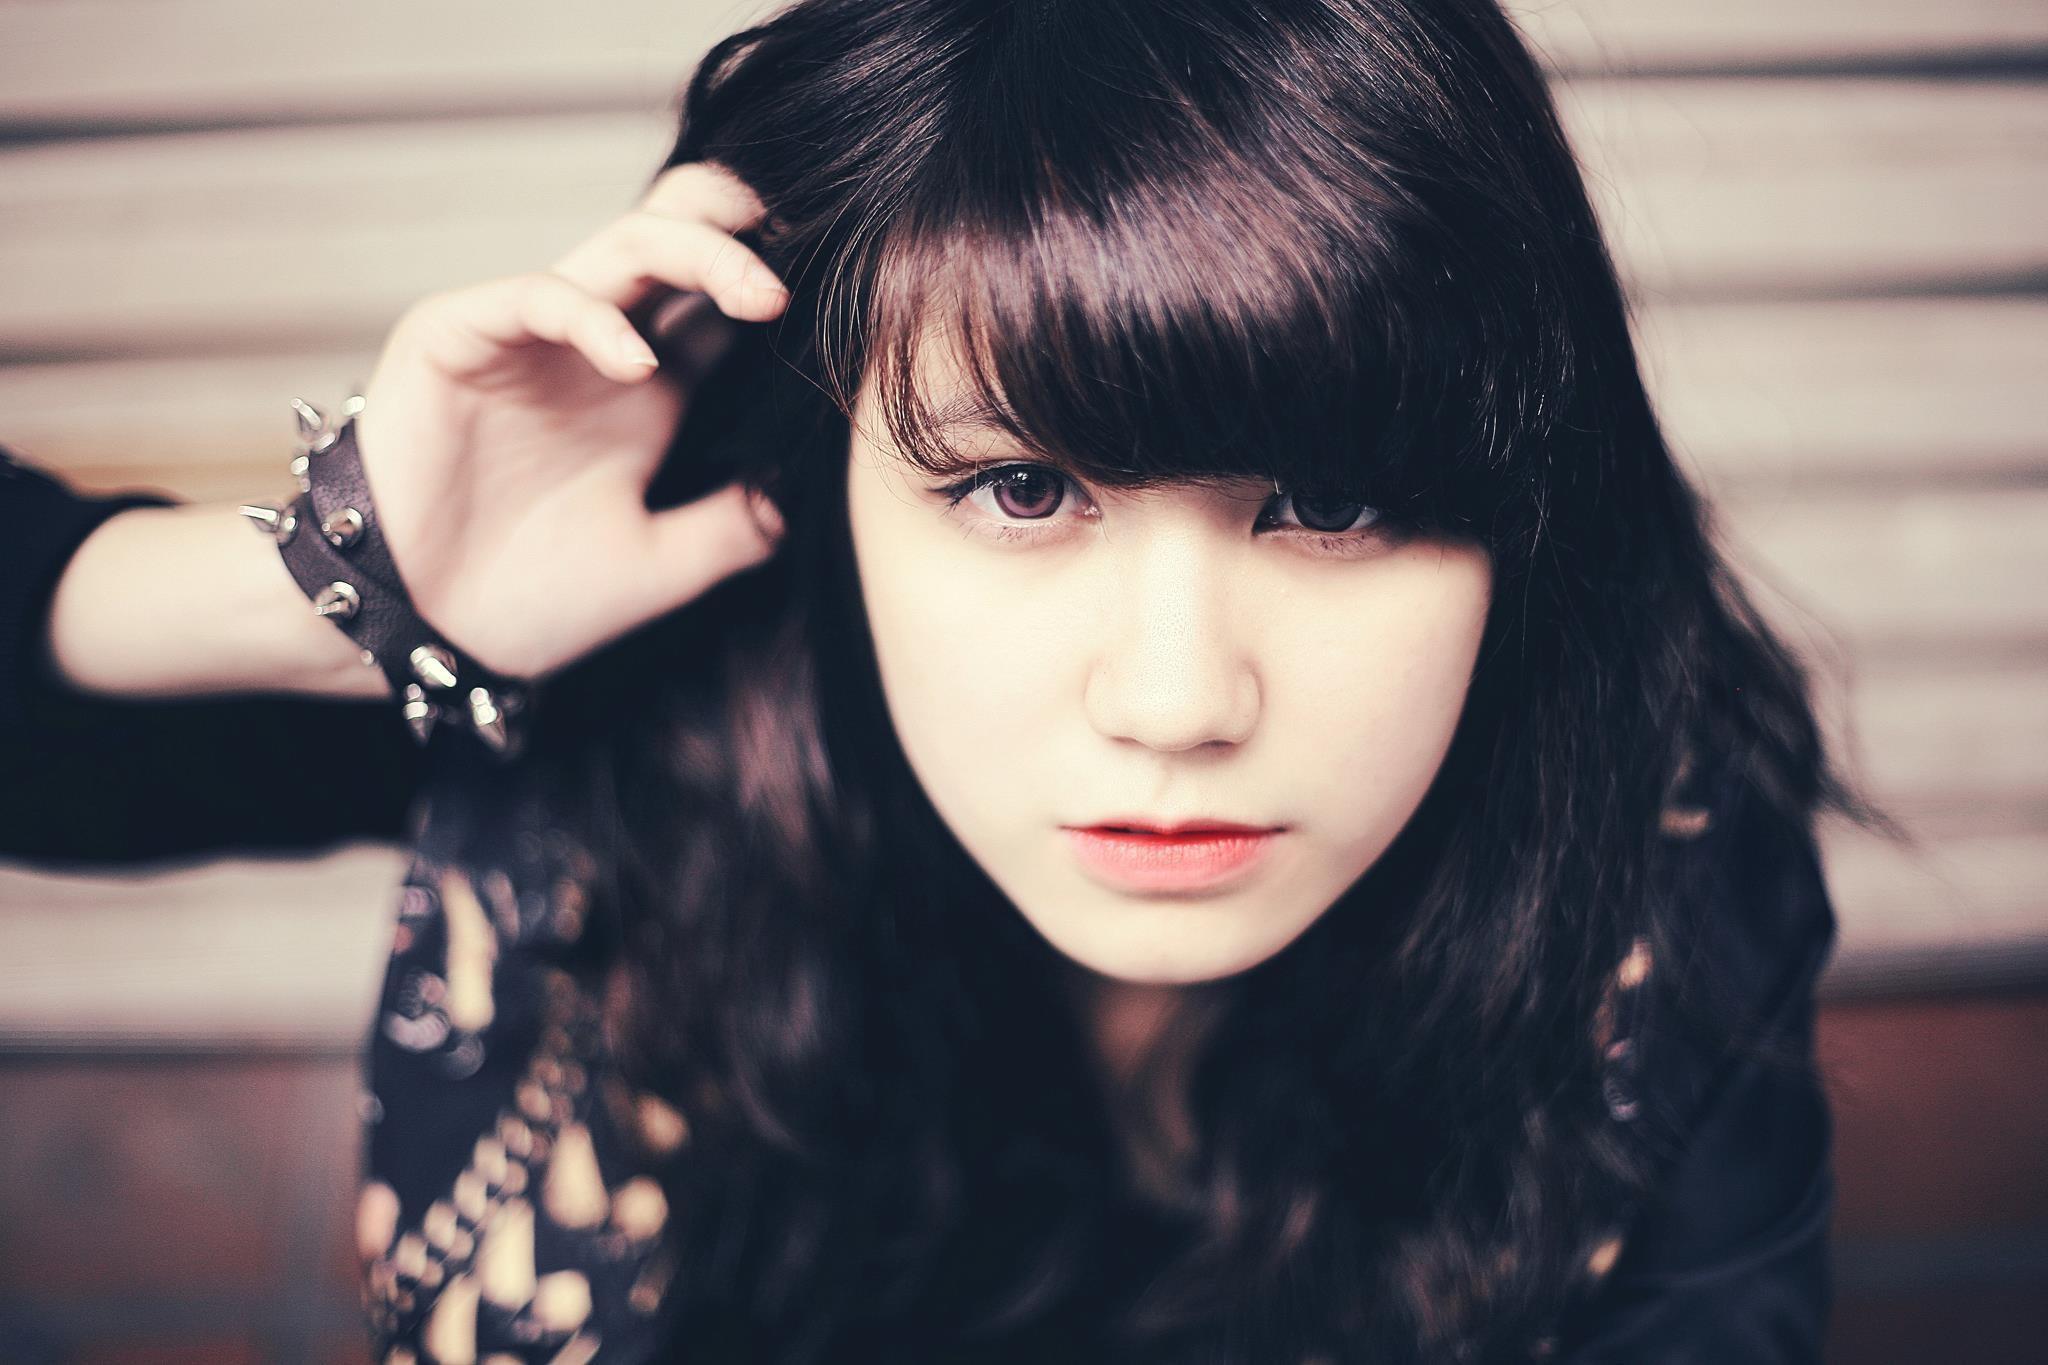 Download Ann Japan Cool Girl Wallpaper | Free Wallpapers